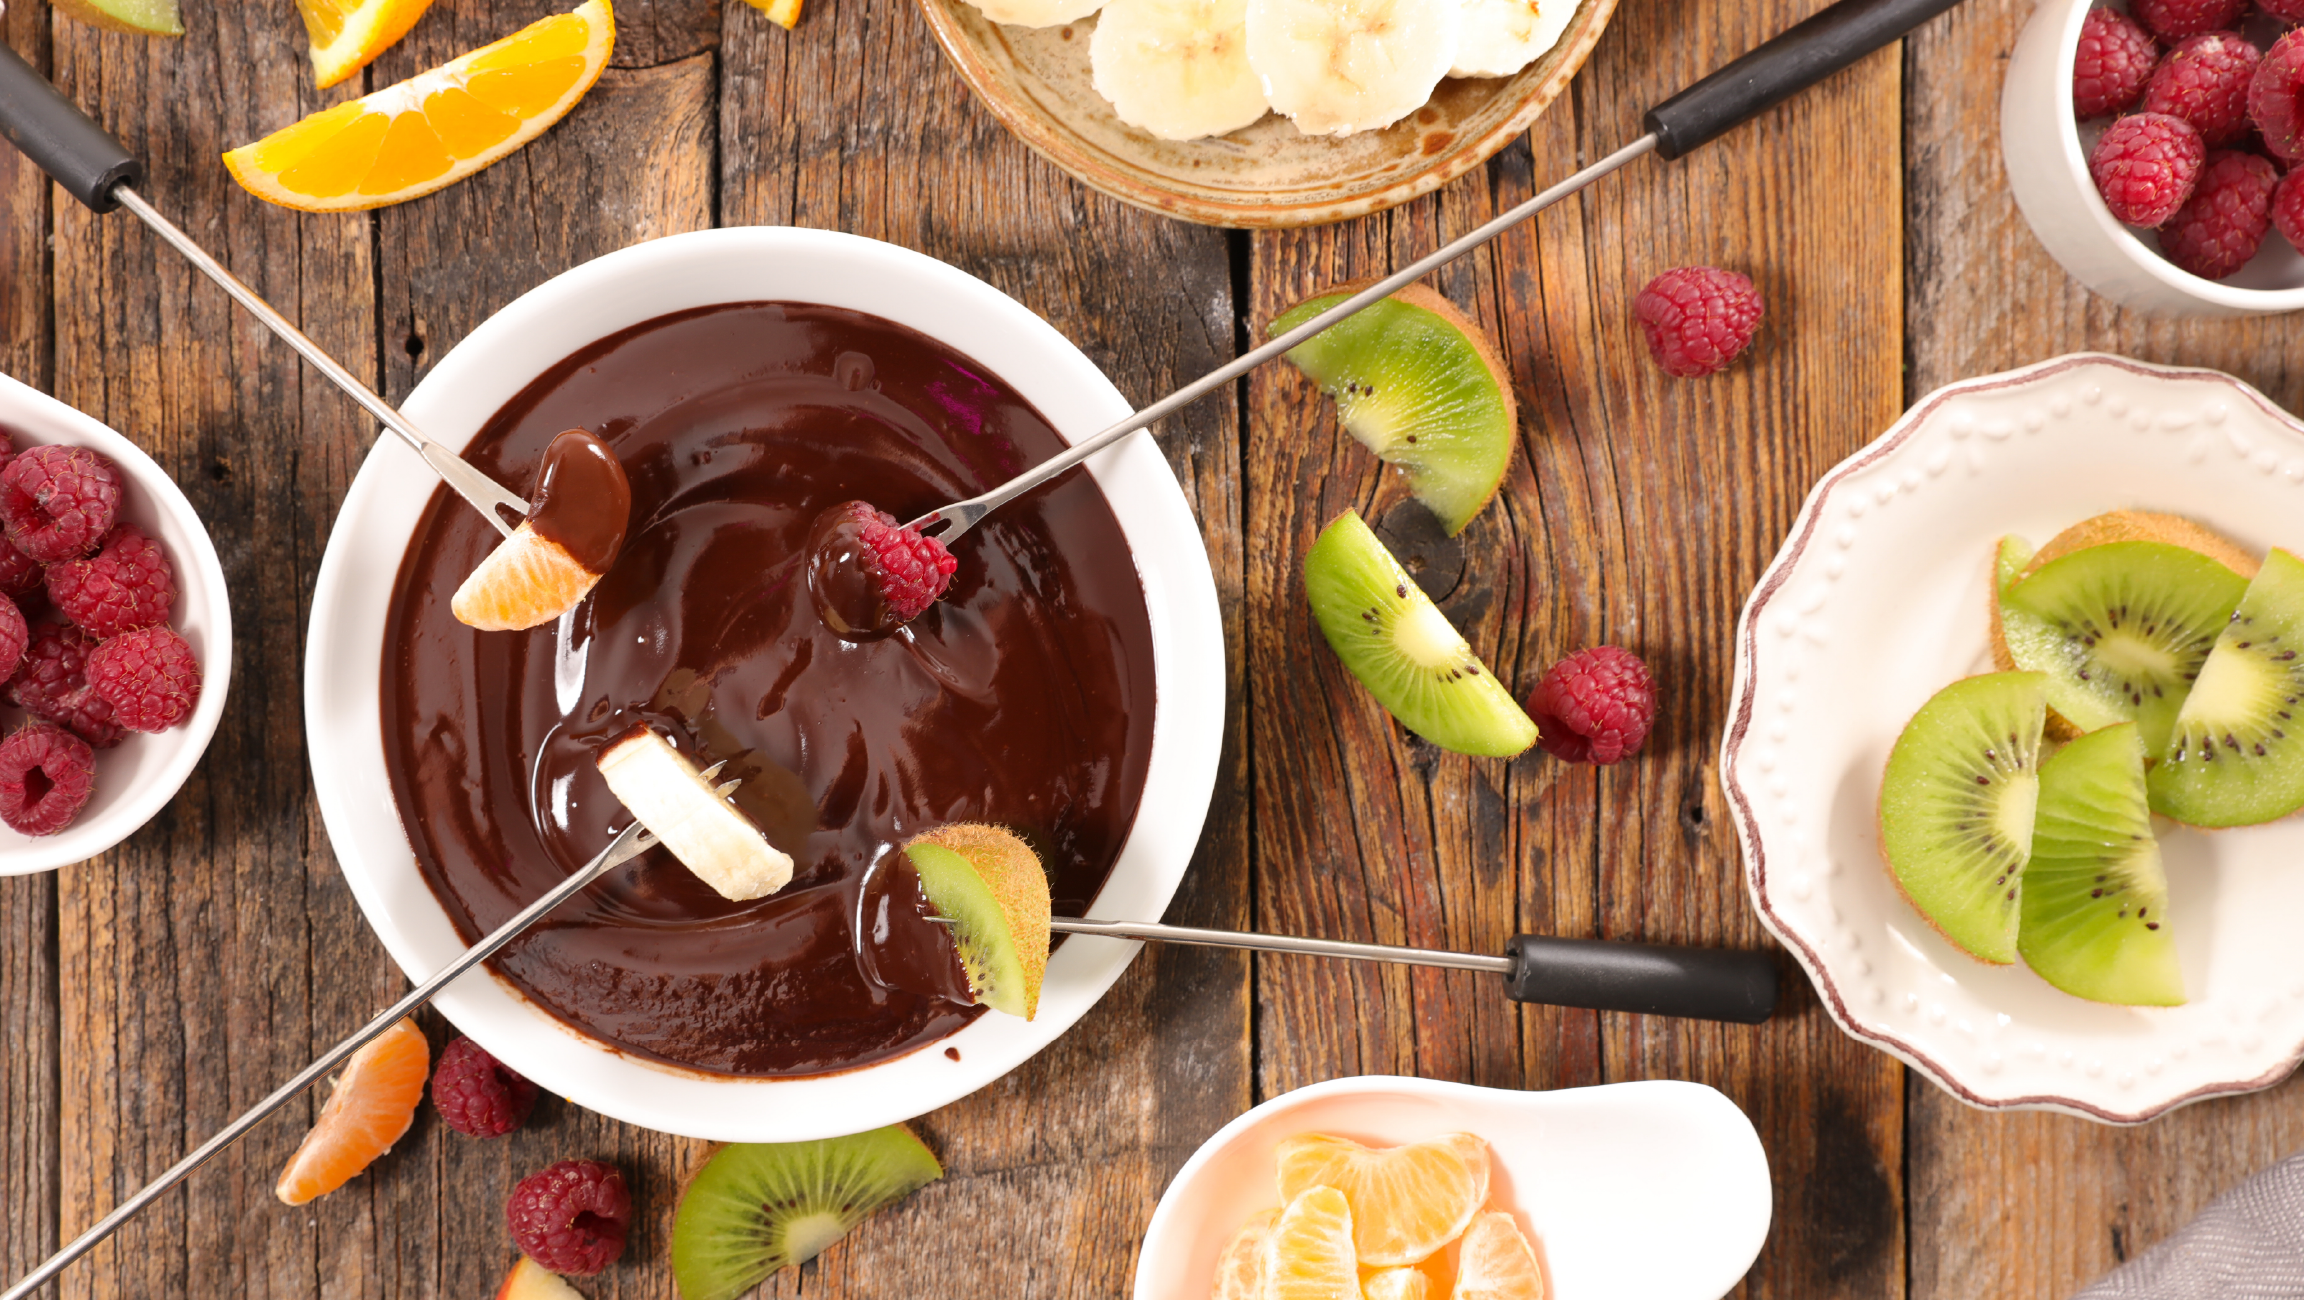 Fondue de chocolat et fruits frais